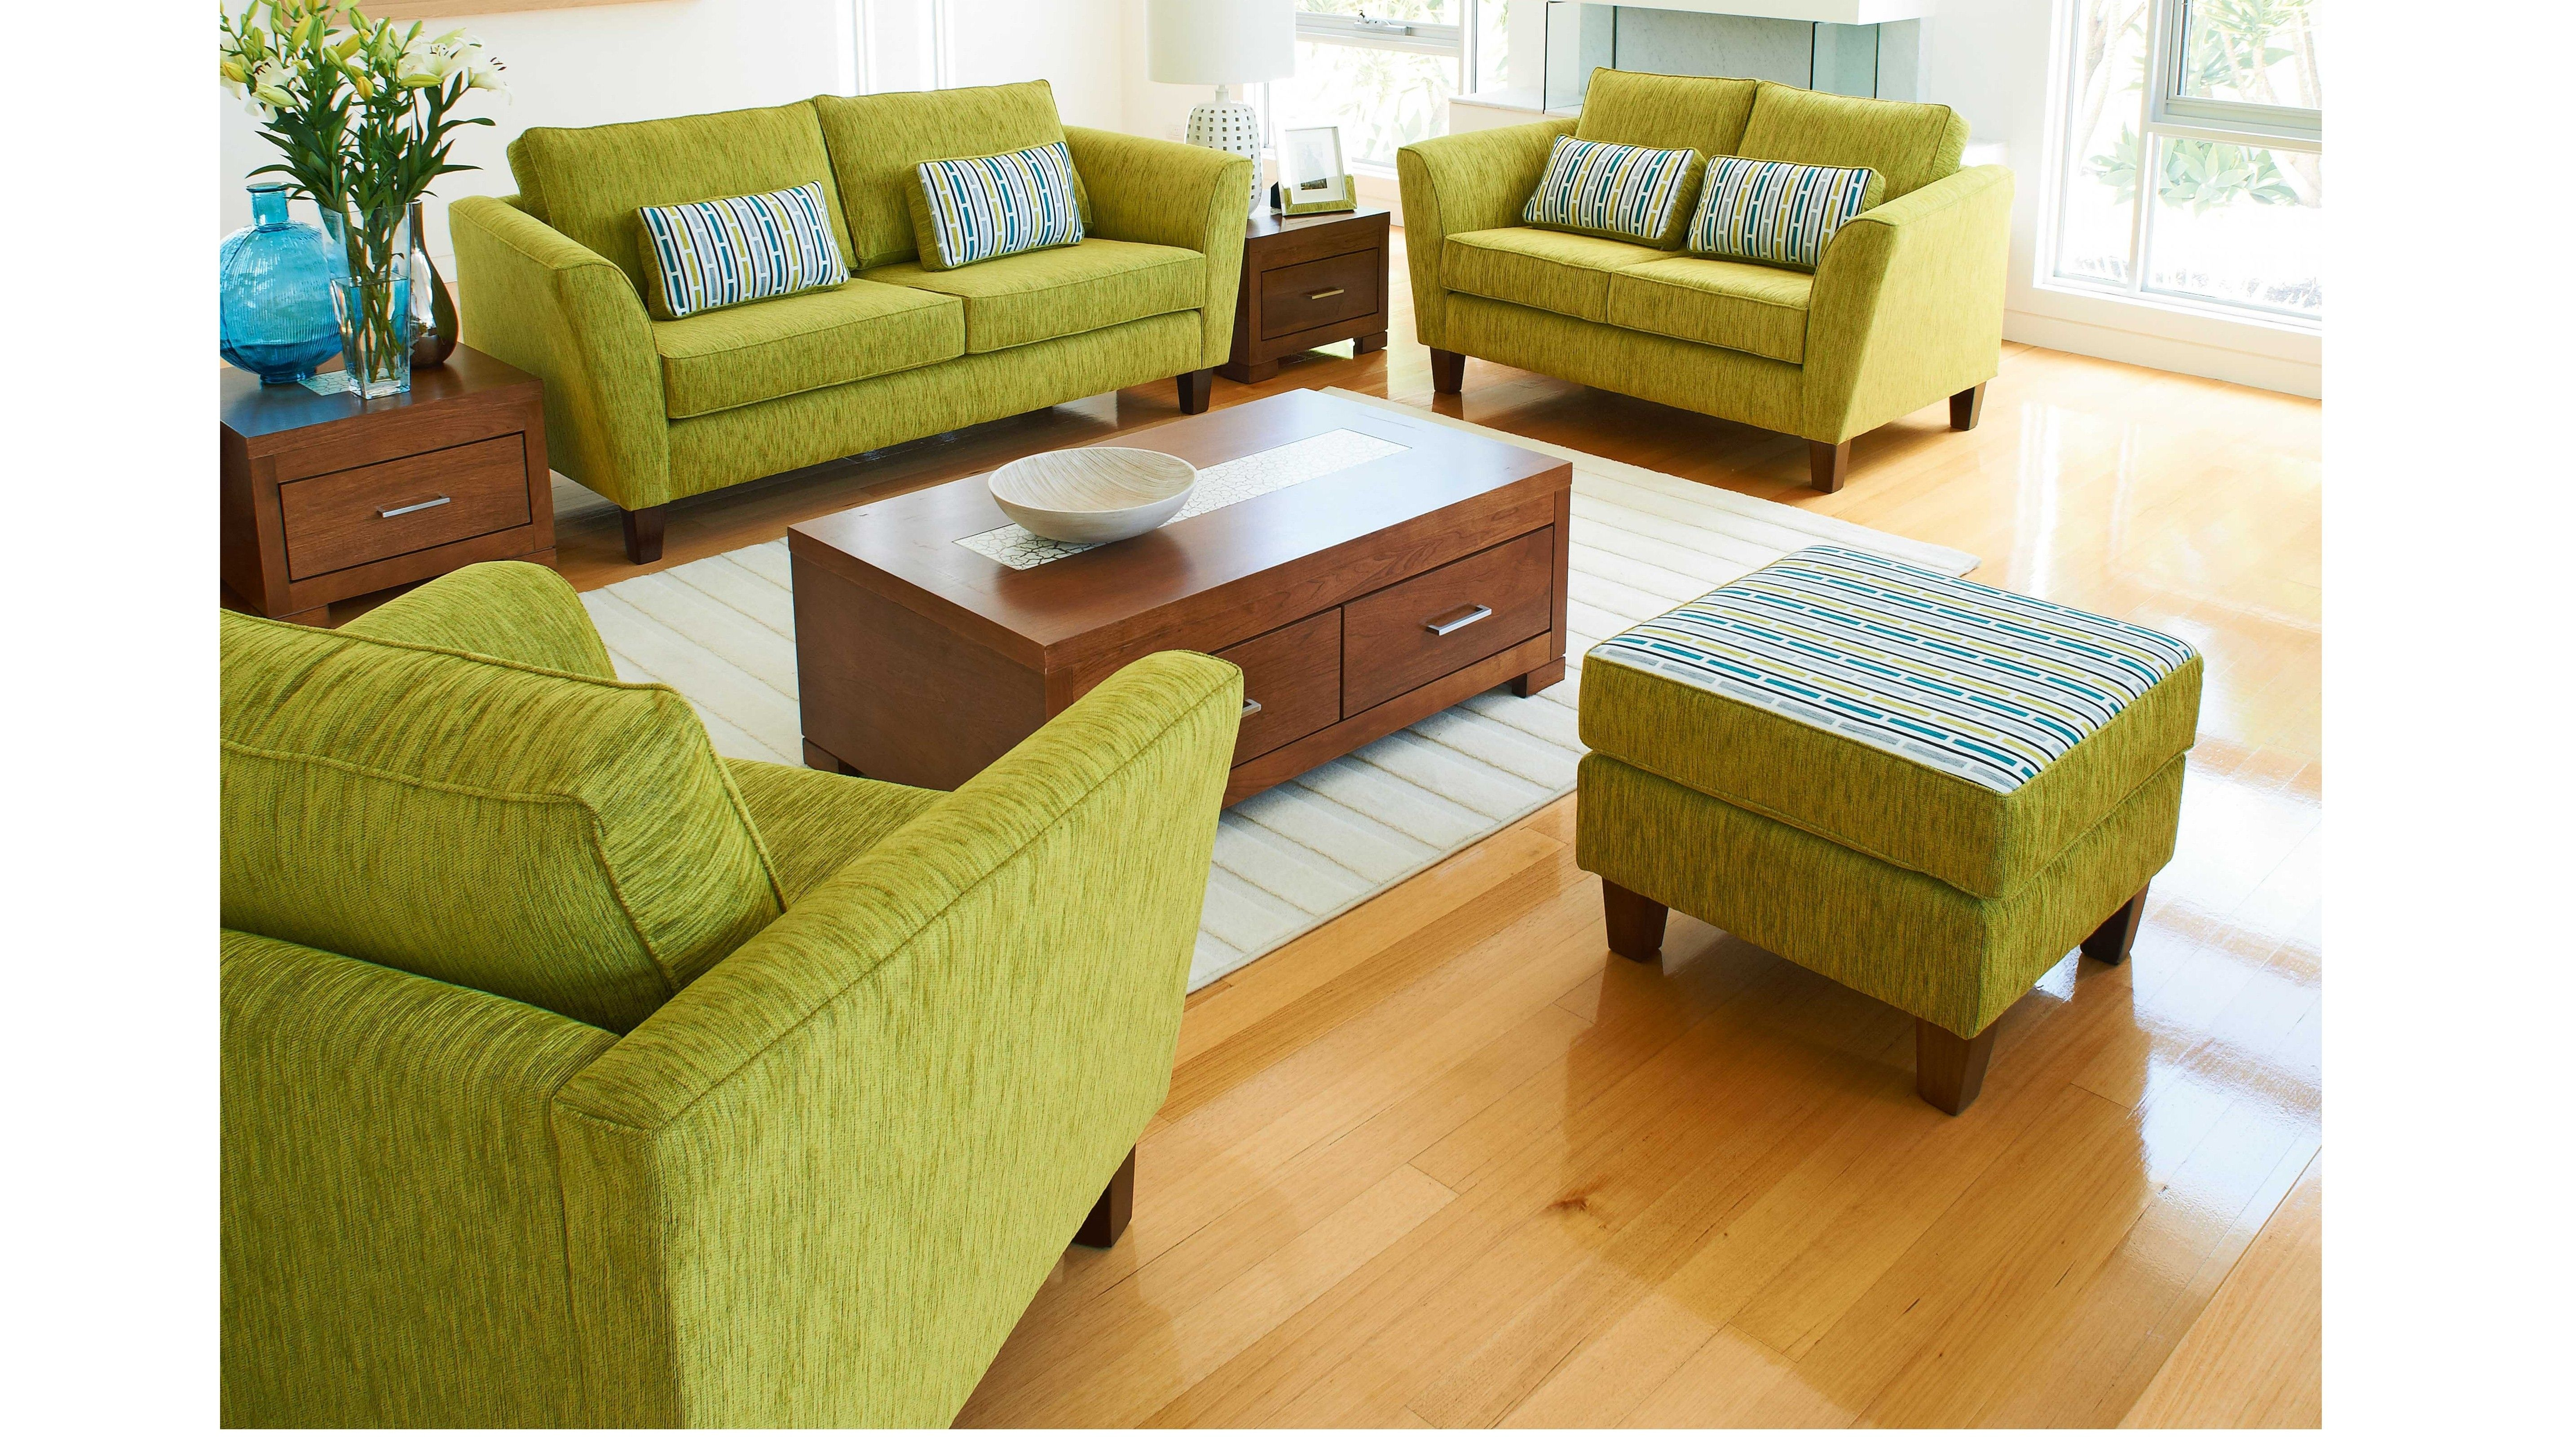 Best Tuross 3 Piece Lounge Suite Fabric Sofa Lounge Suites 400 x 300